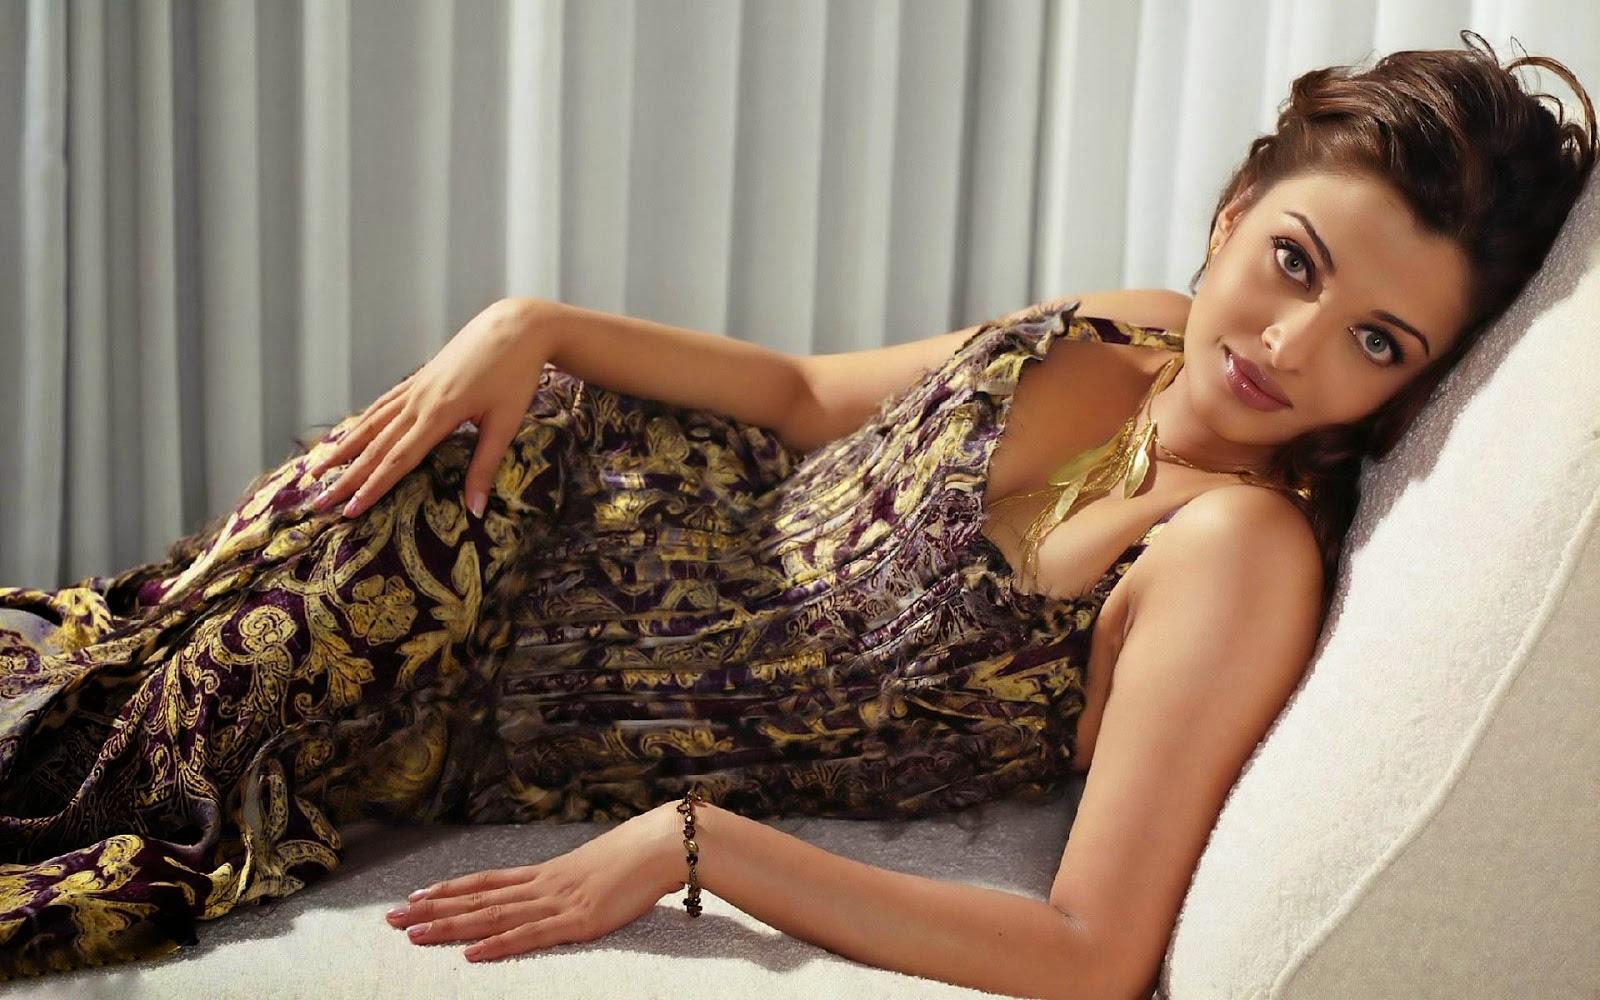 Bollywood aishwarya rai on bed or sofa desktop wallpaper